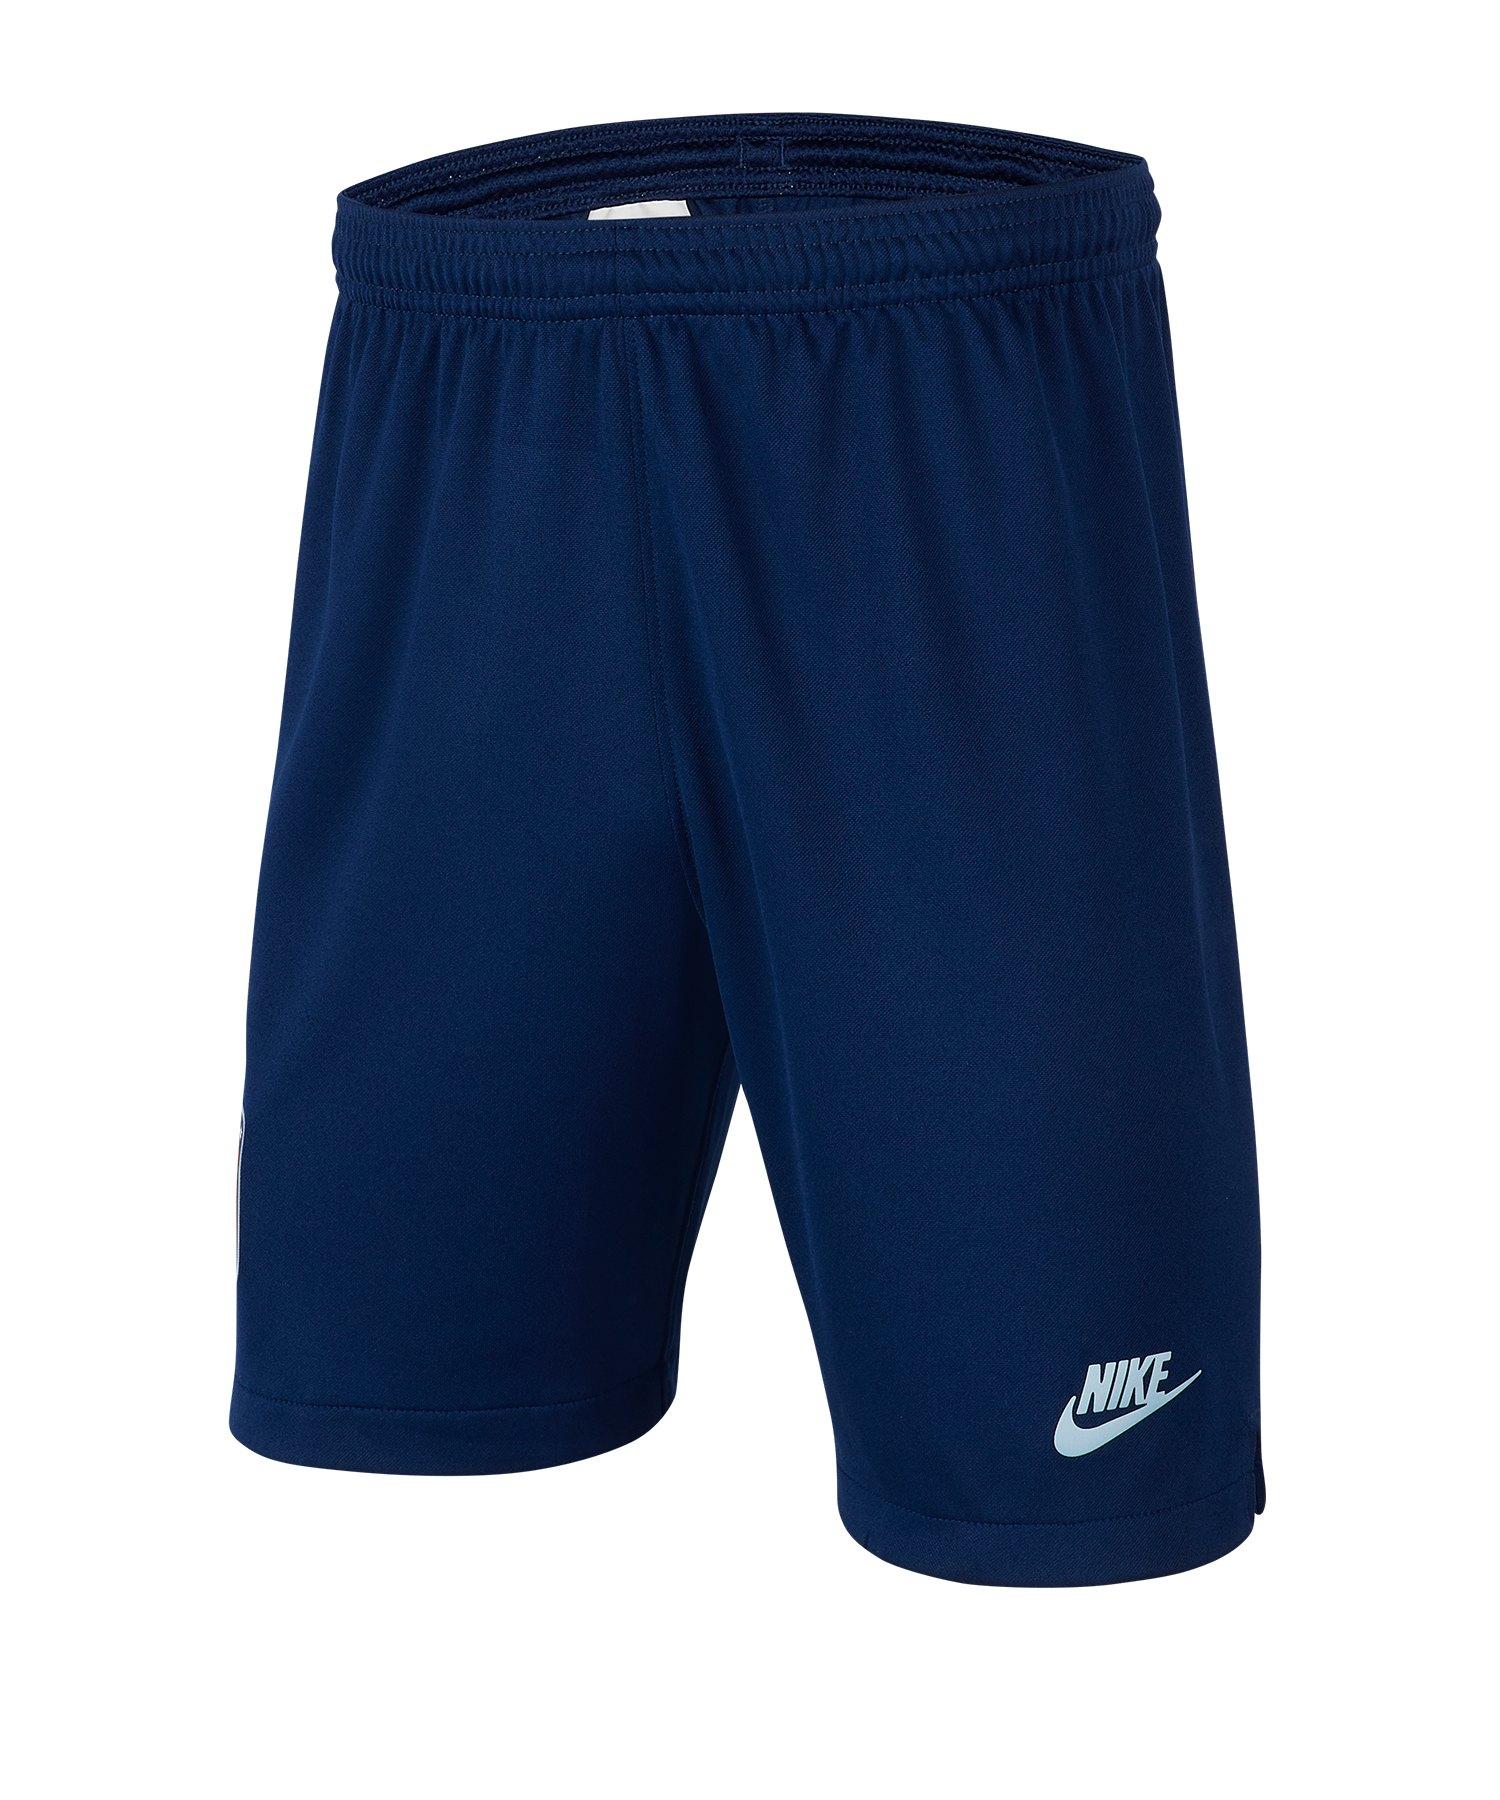 Nike Atletico Madrid Short Kids 19/20 Blau F492 - blau